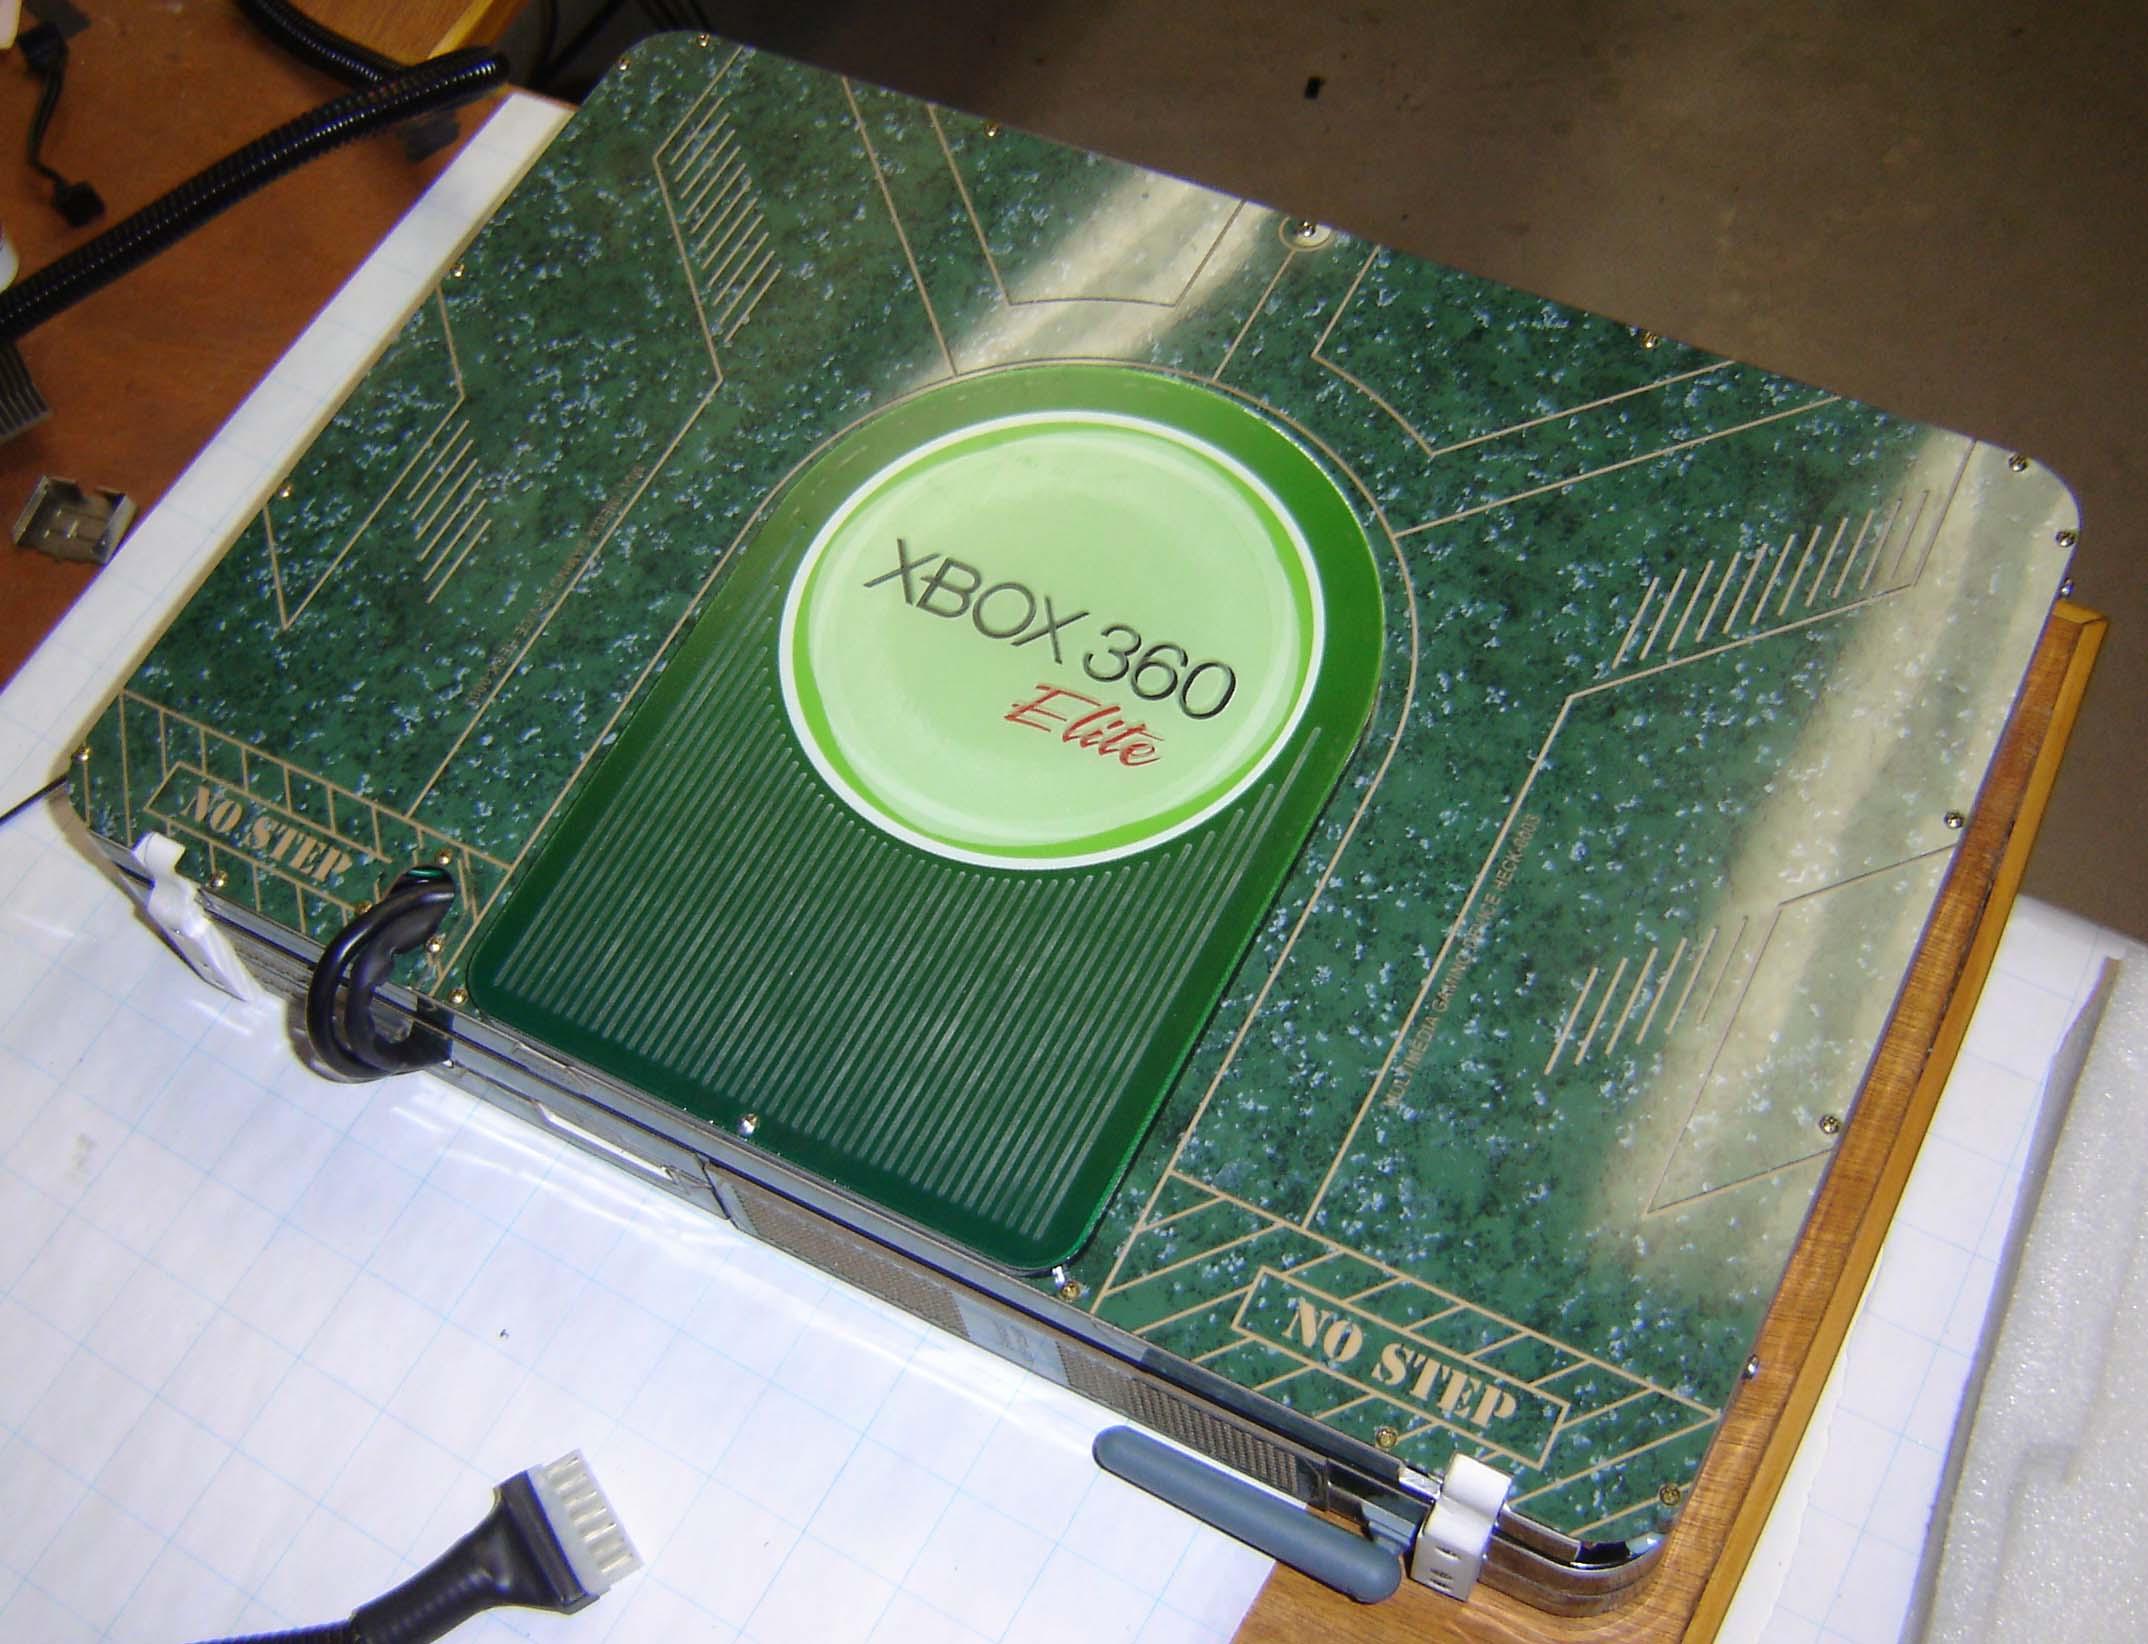 Xbox 360 Laptop 3 Elite Web Portal For Benjamin J Heckendorn Wiring Harness Click Here